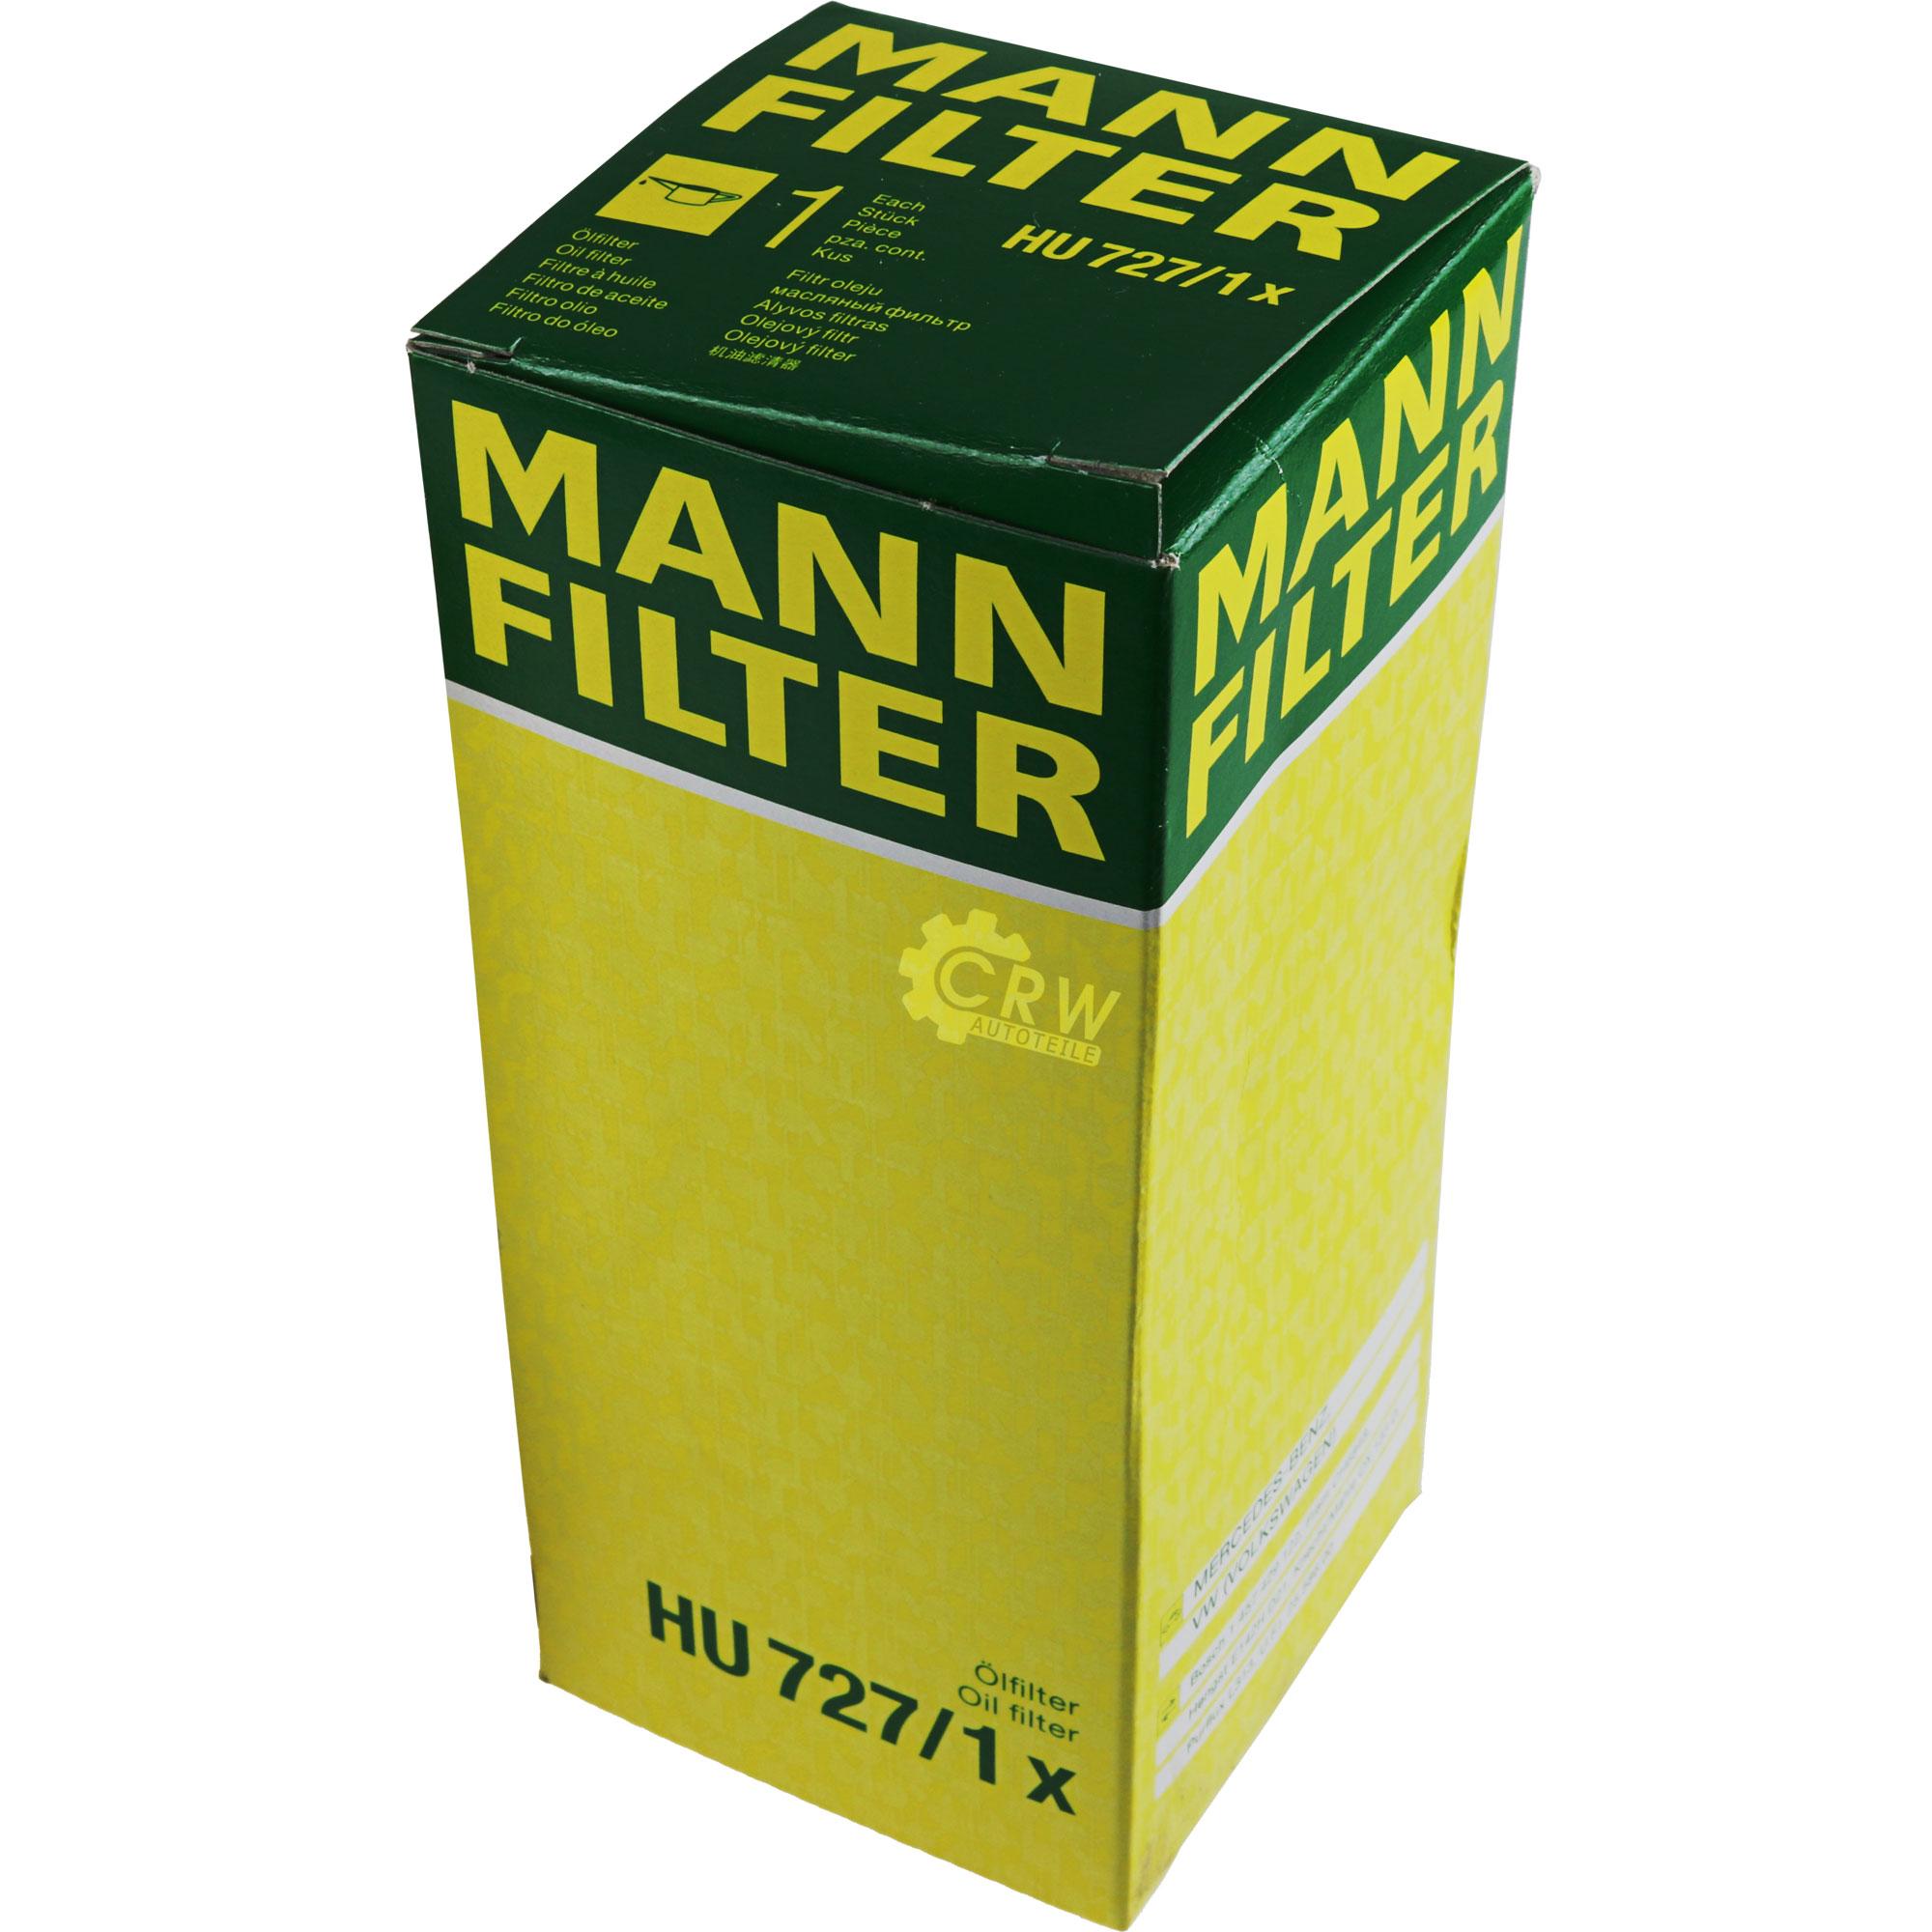 Motor-Ol-8L-MANNOL-Classic-10W-40-MANN-FILTER-Mercedes-Benz-Stufenheck-W124 Indexbild 9